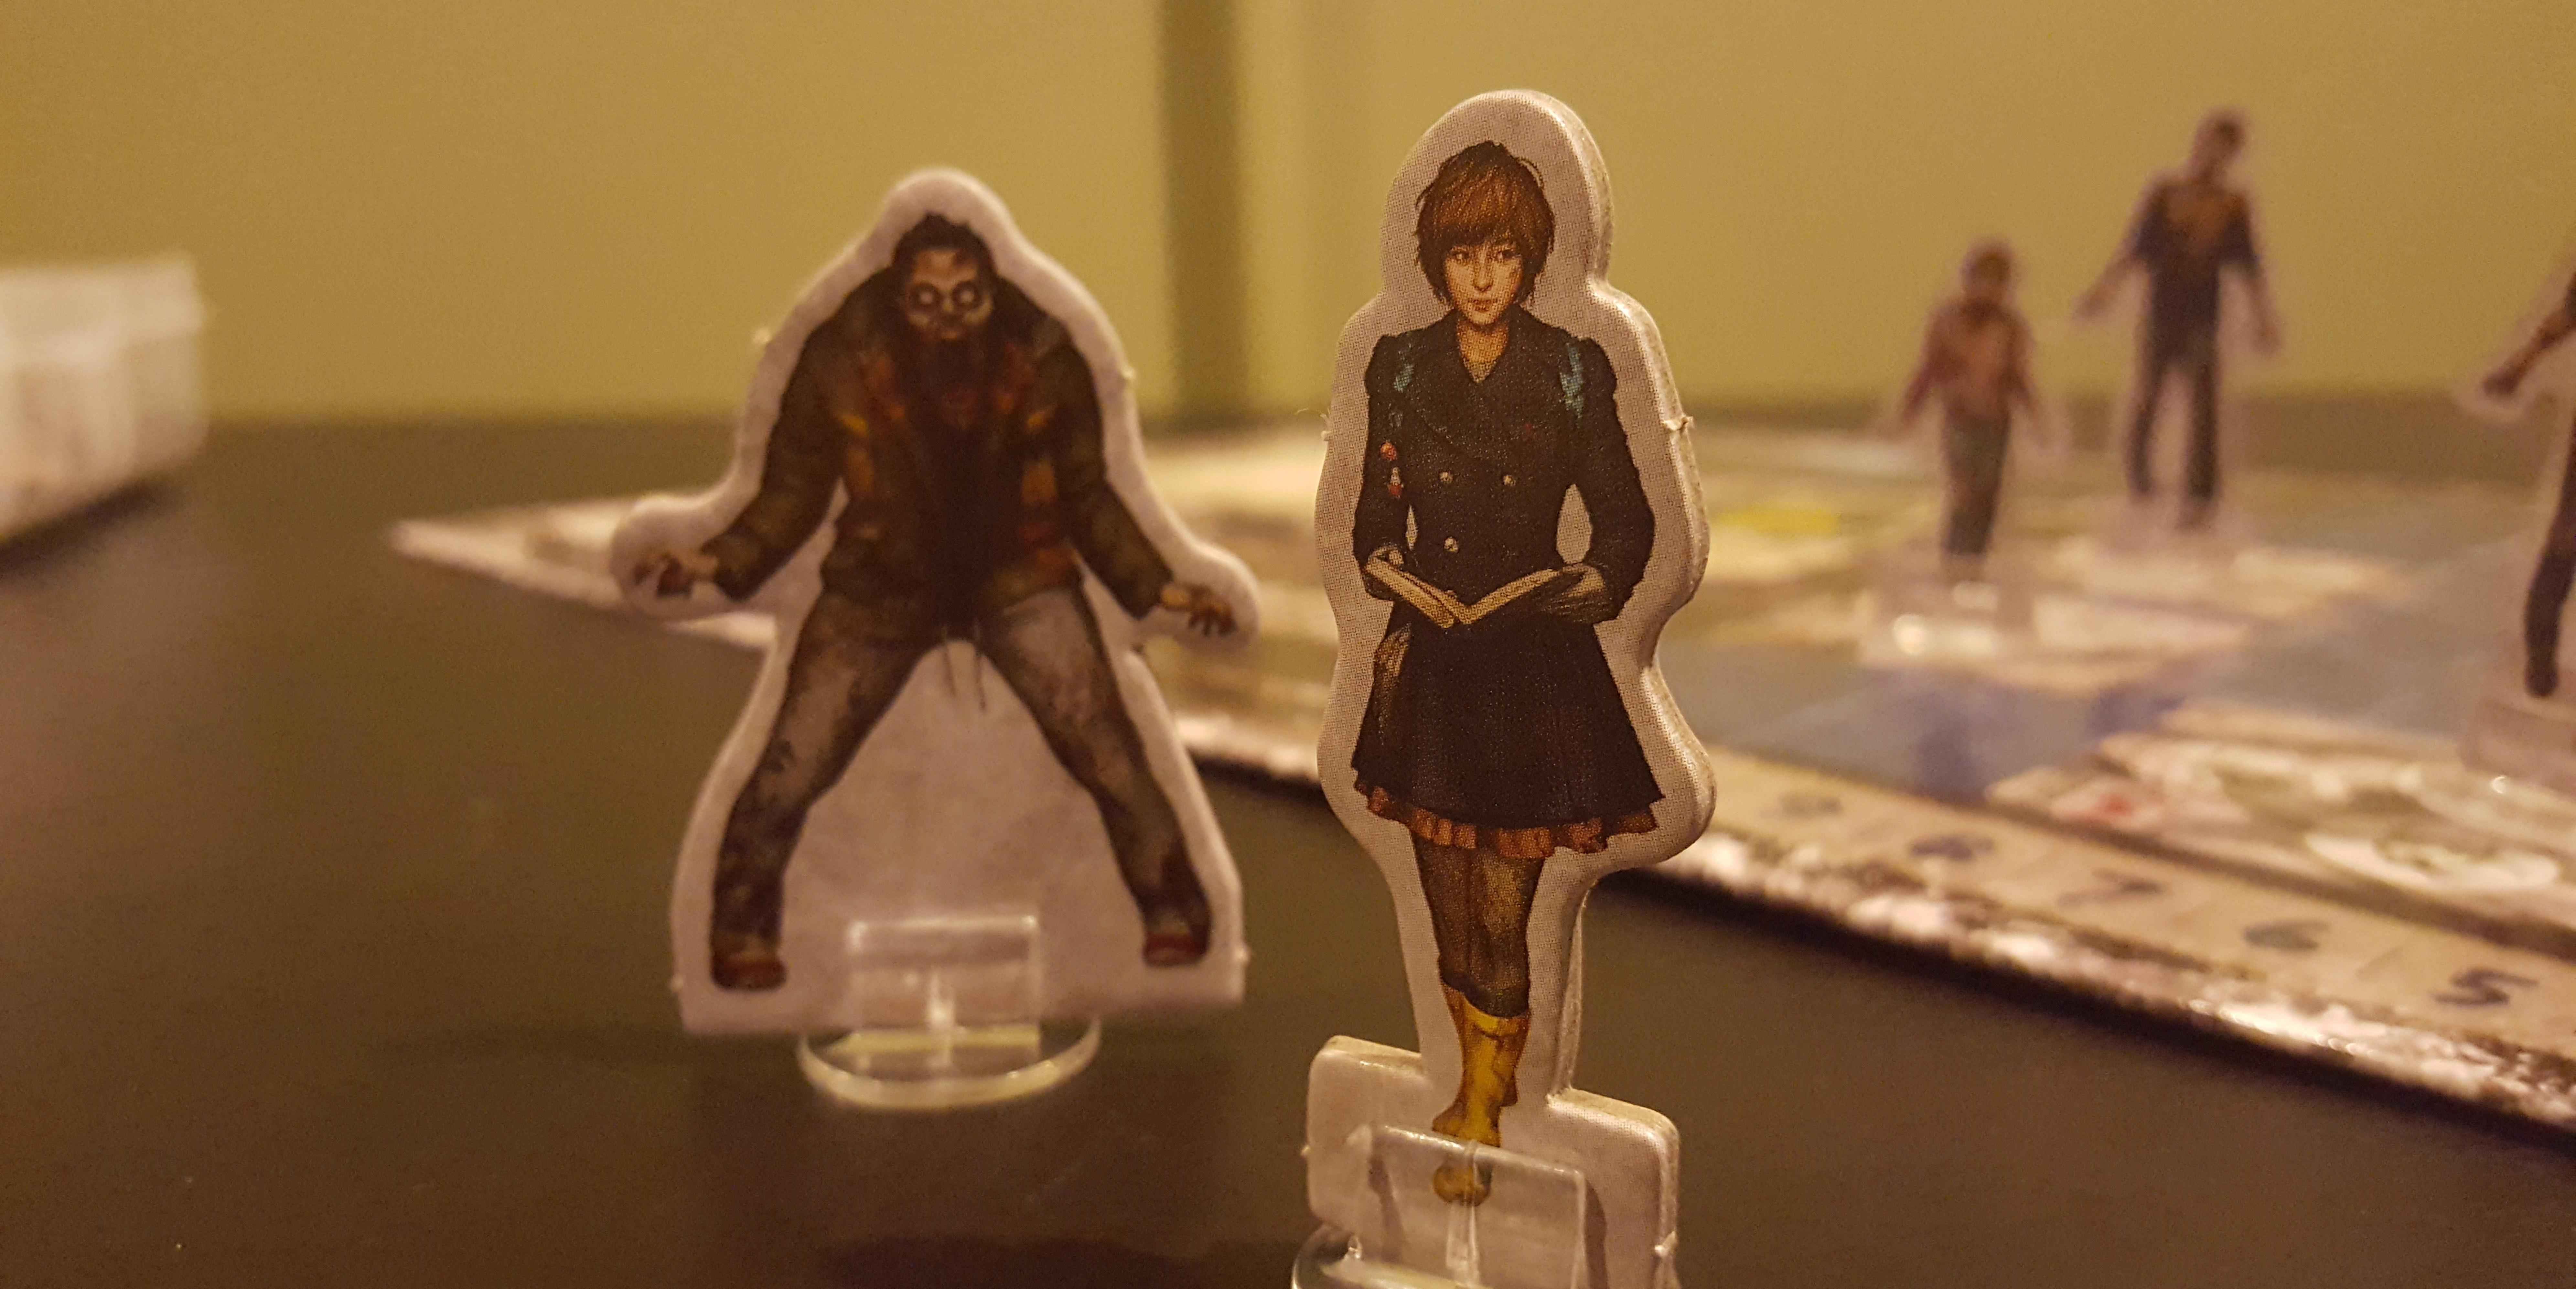 Zombie Board Gaming Makes Pandemics Visceral